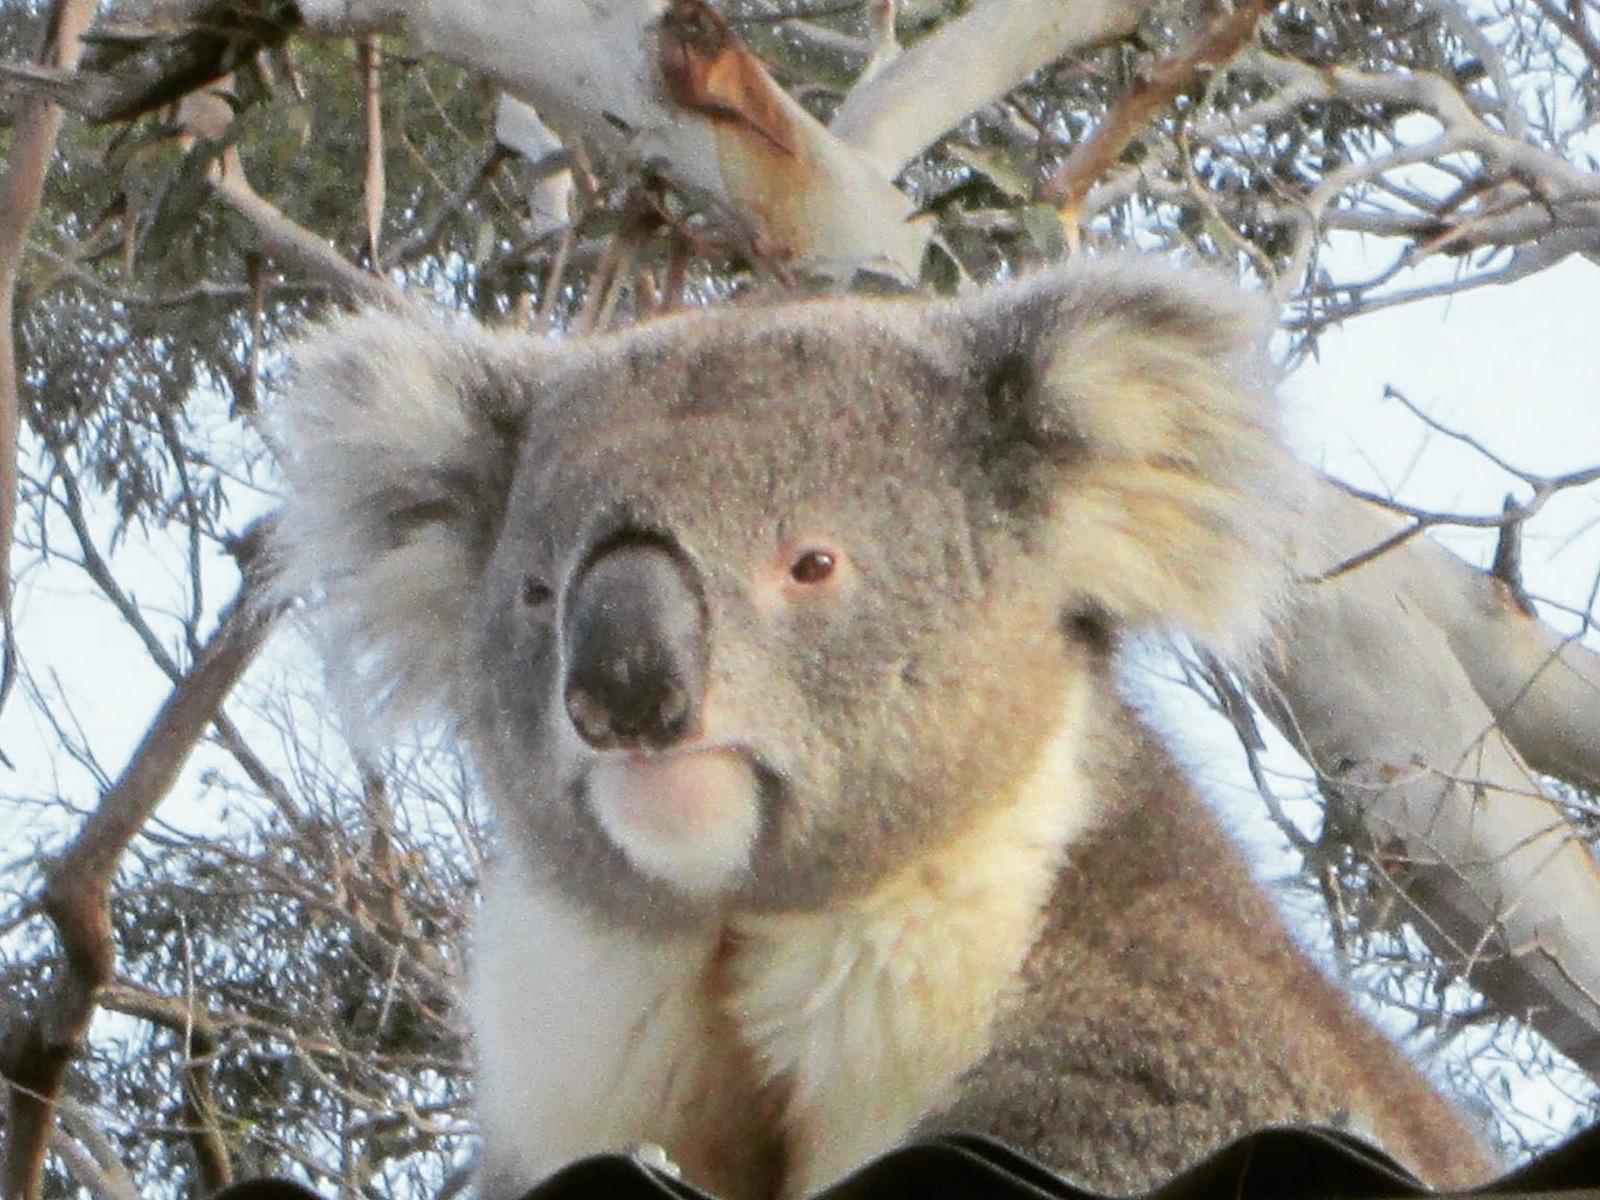 Koala Up Close